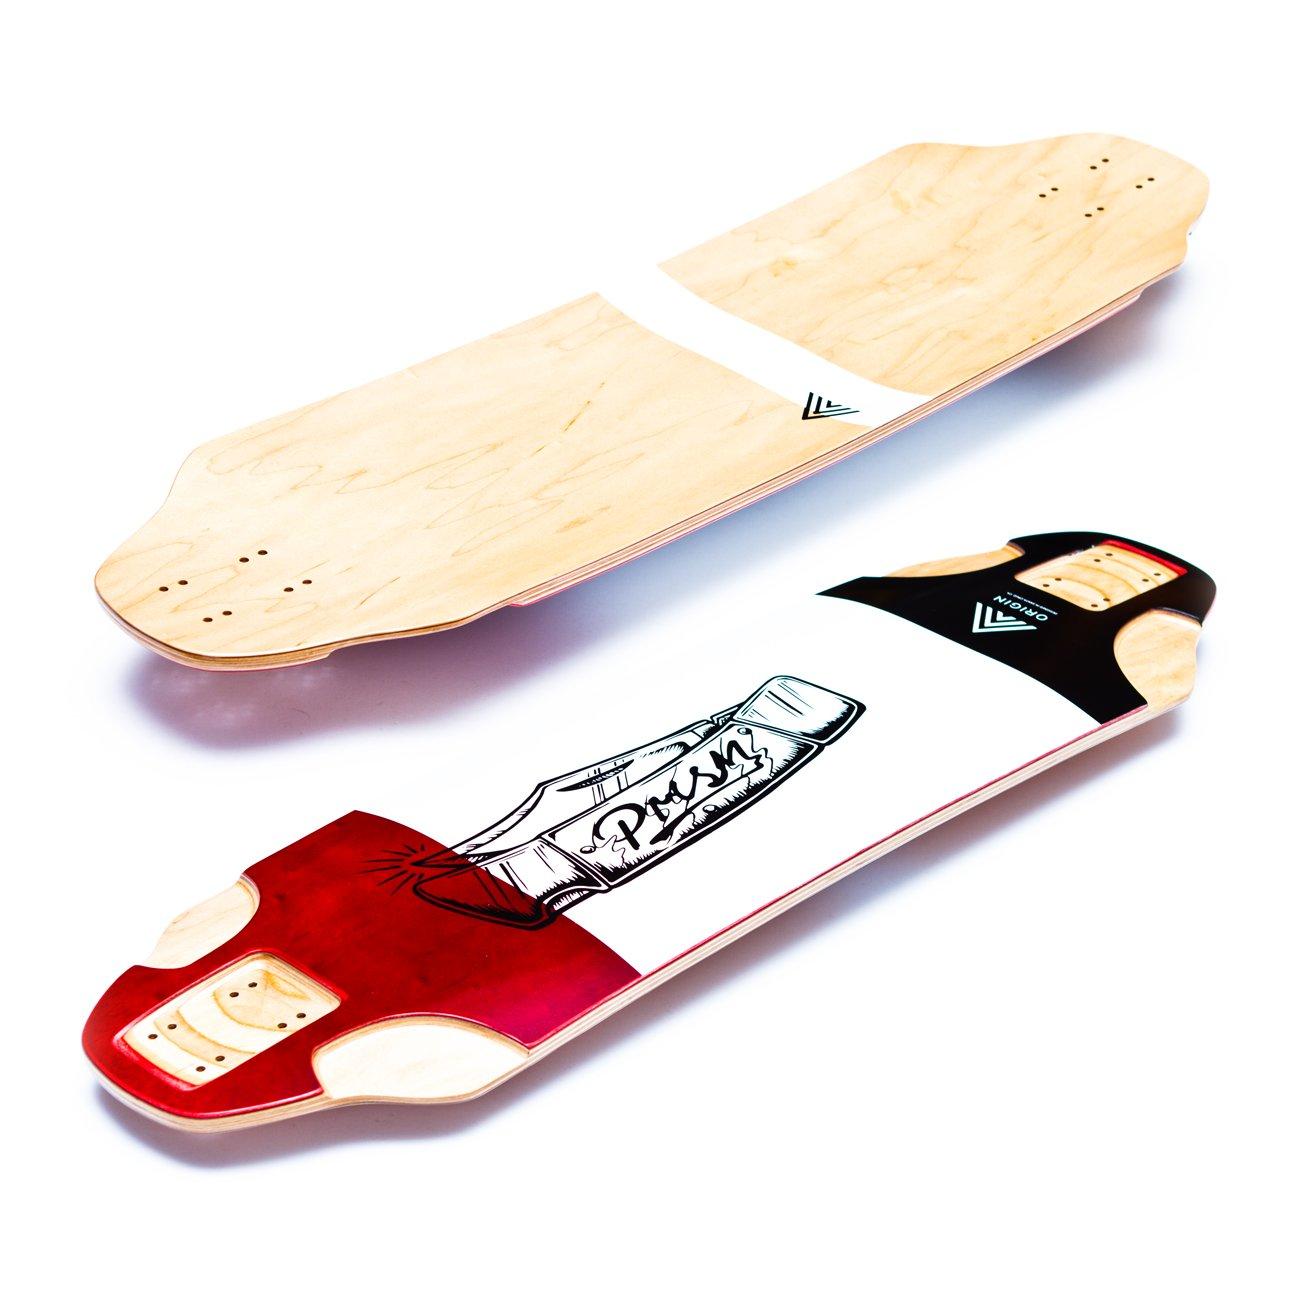 PRISM Skate Co. – Origin V2. Vyprodaný. Previous  Next 15b1296c434